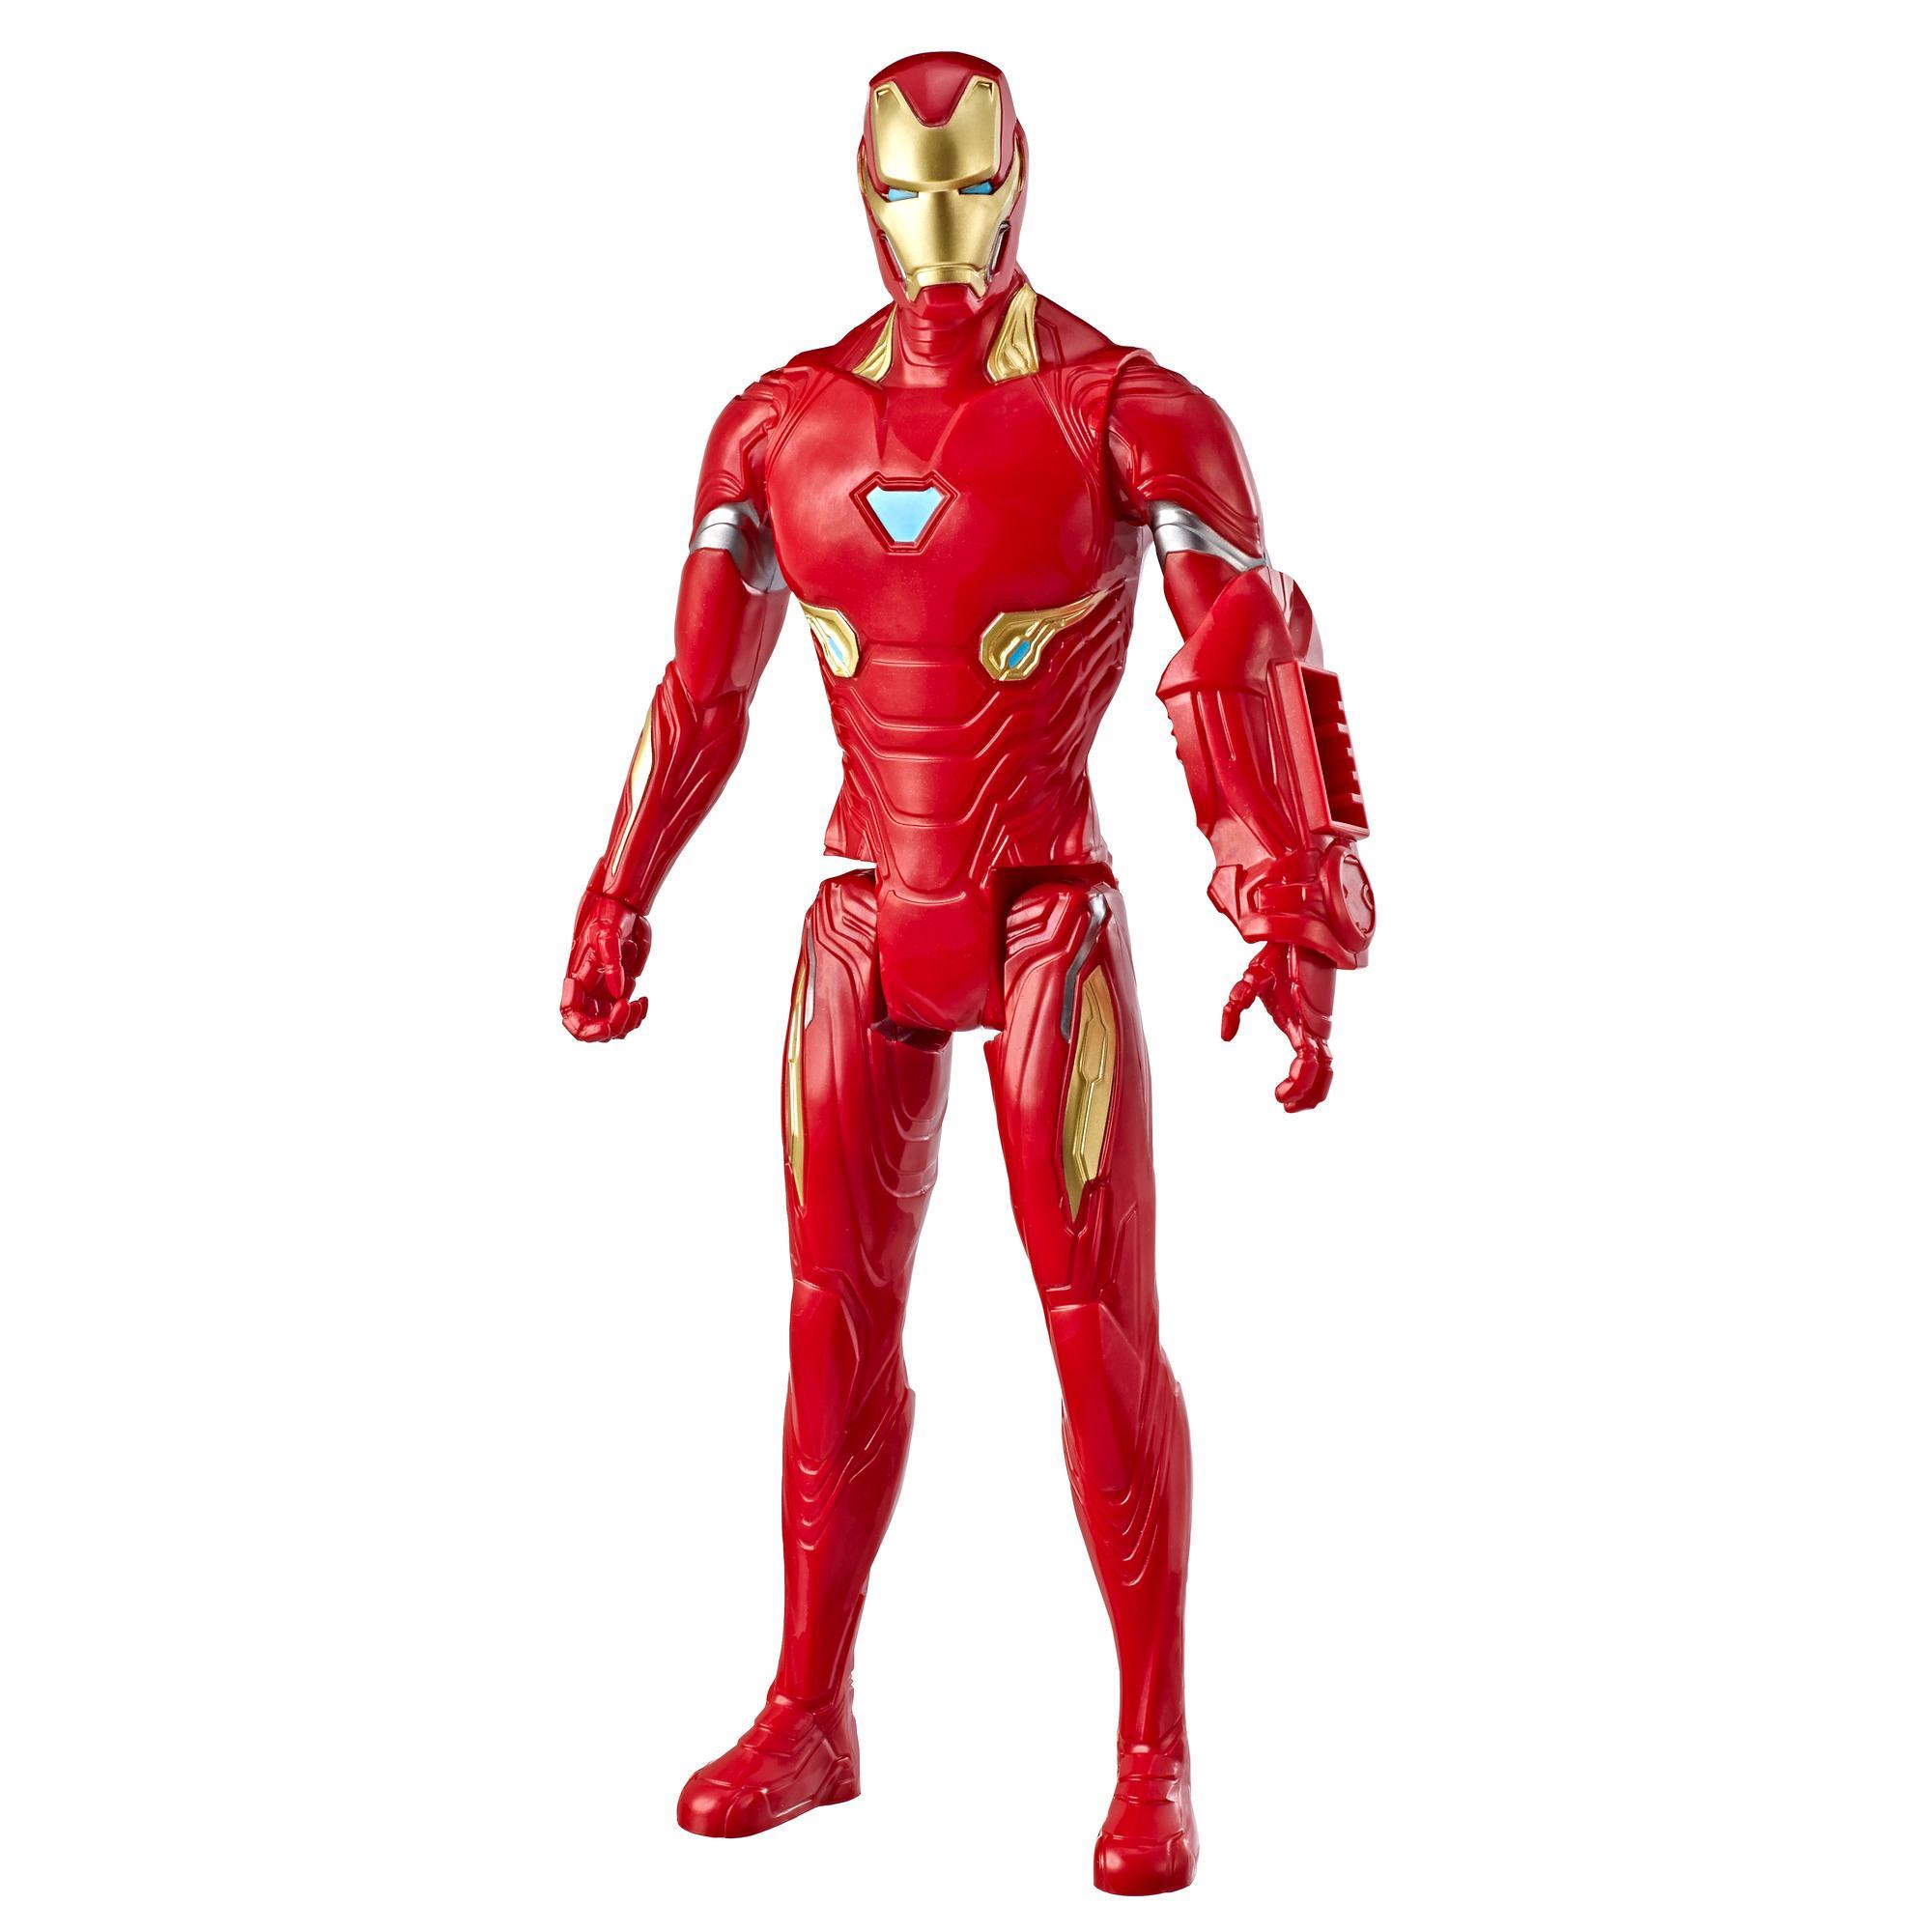 Marvel Avengers: Endgame Titan Hero Iron Man Figür